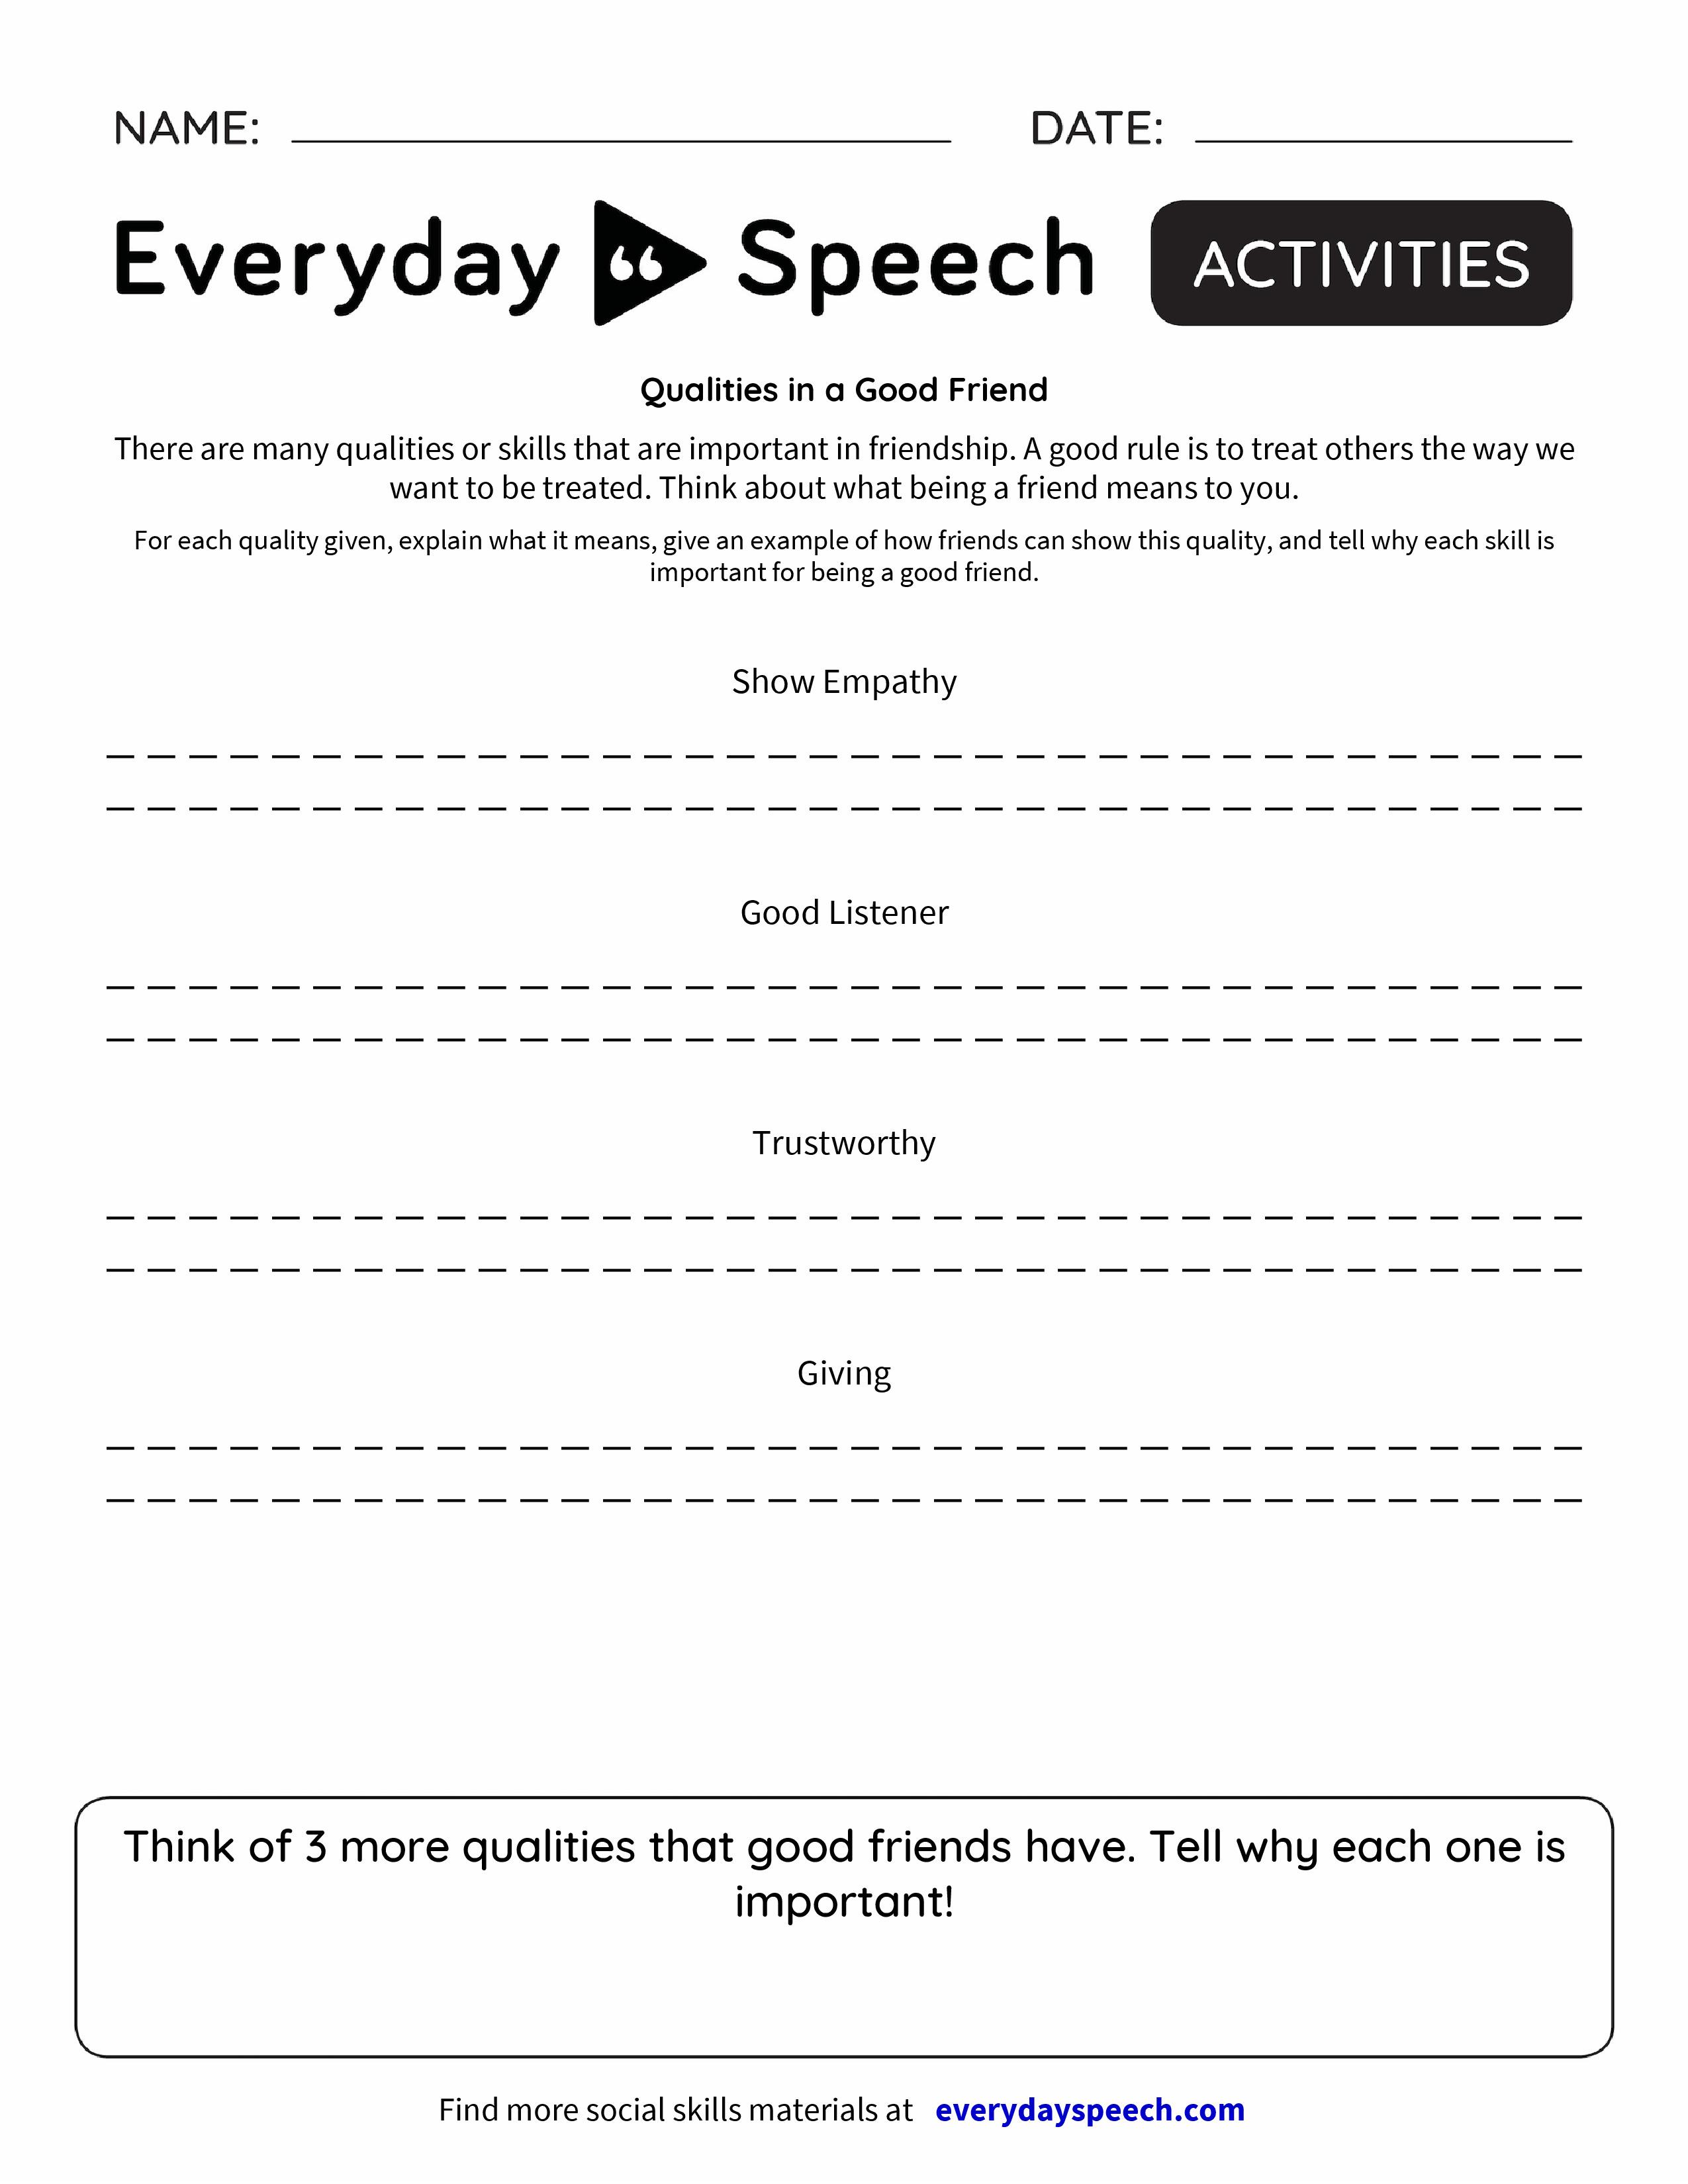 qualities in a good friend everyday speech everyday speech preview